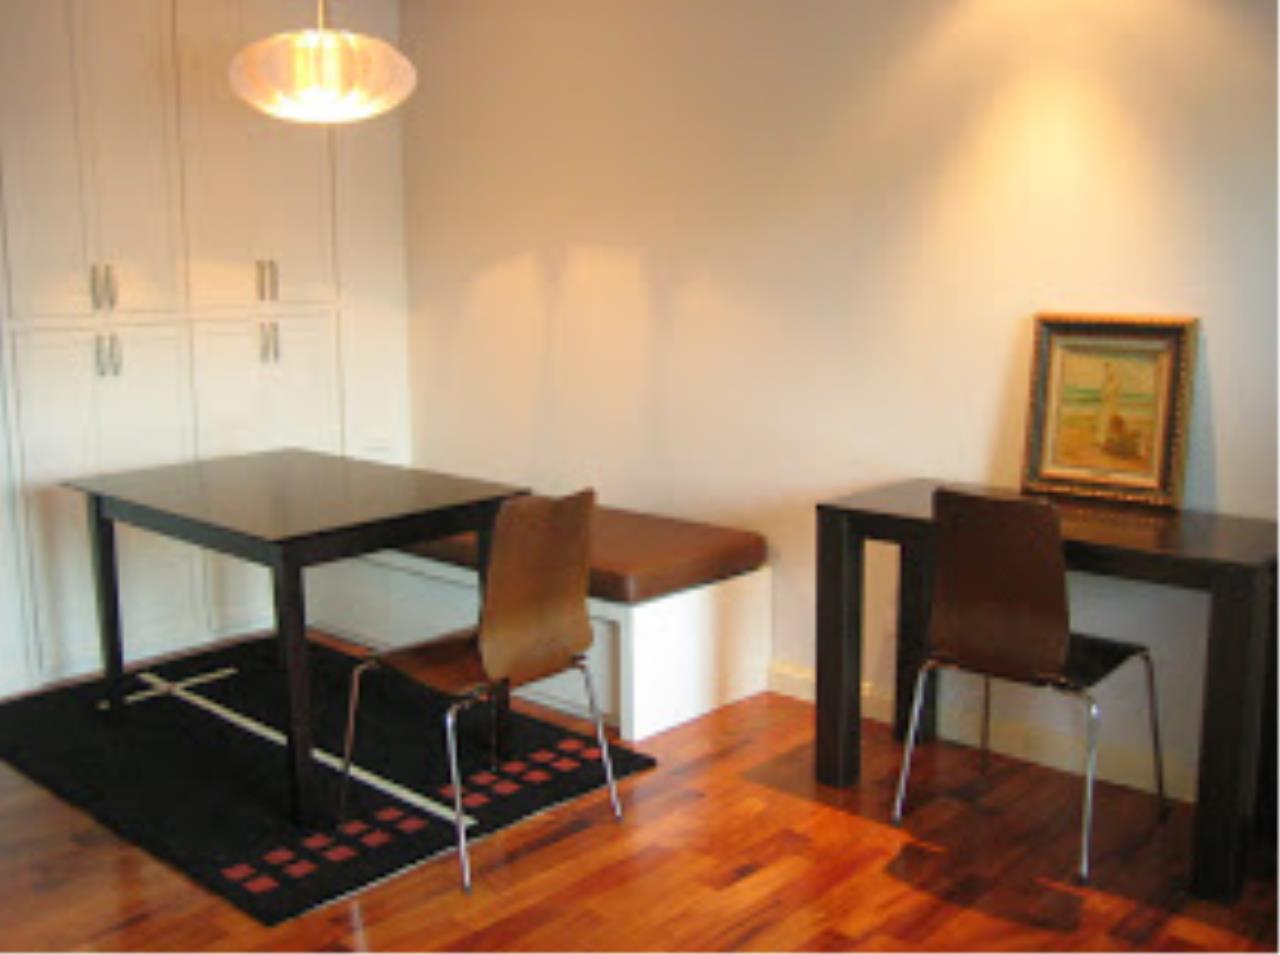 BKK Condos Agency's 1 bedroom condo for rent in Thong Lo at 49 Plus  13